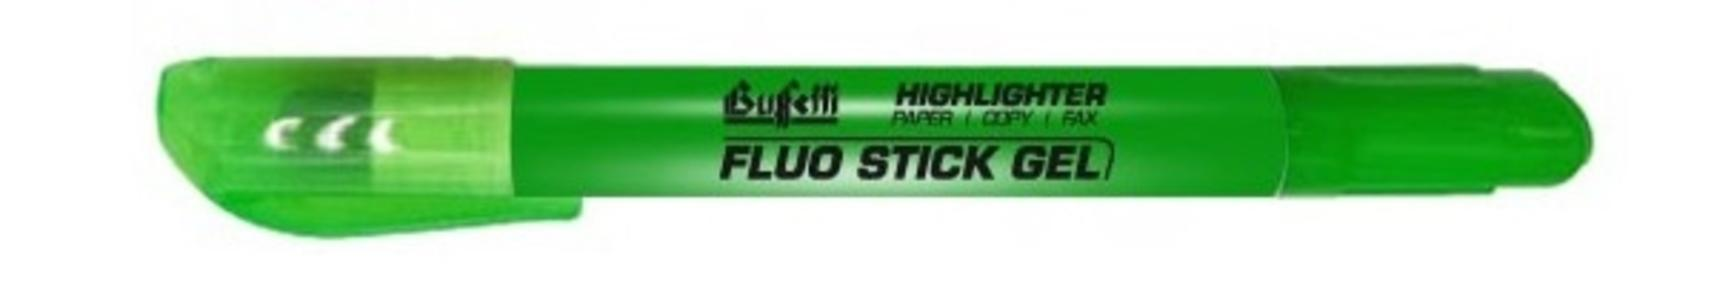 Evidenziatore Fluo Stick Gel - colore verde